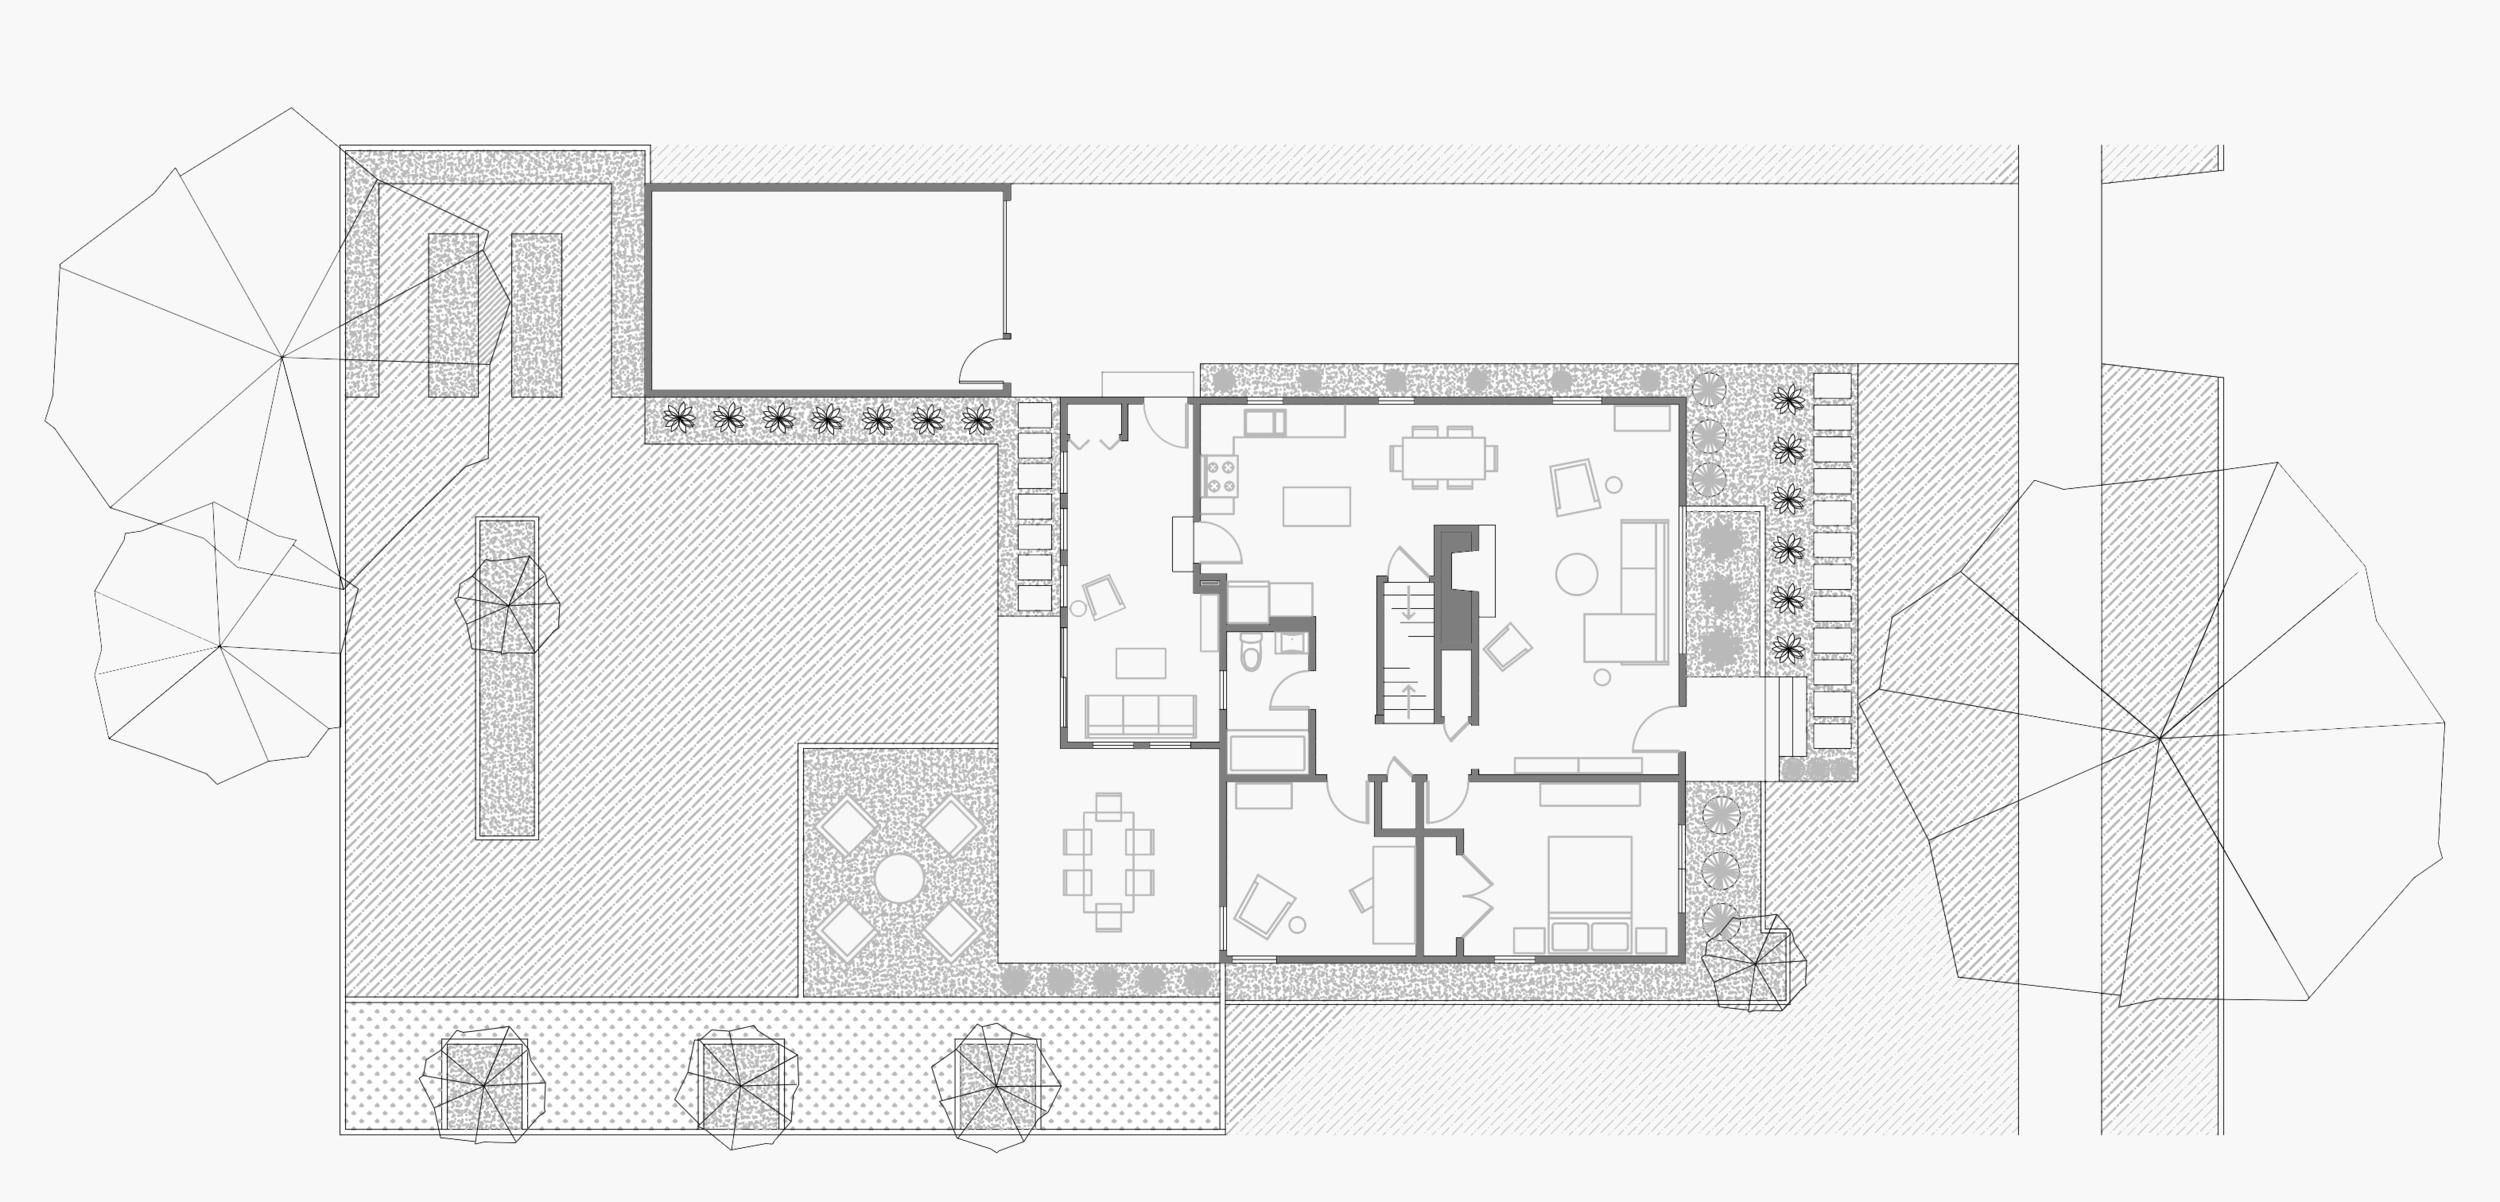 fw site plan.png